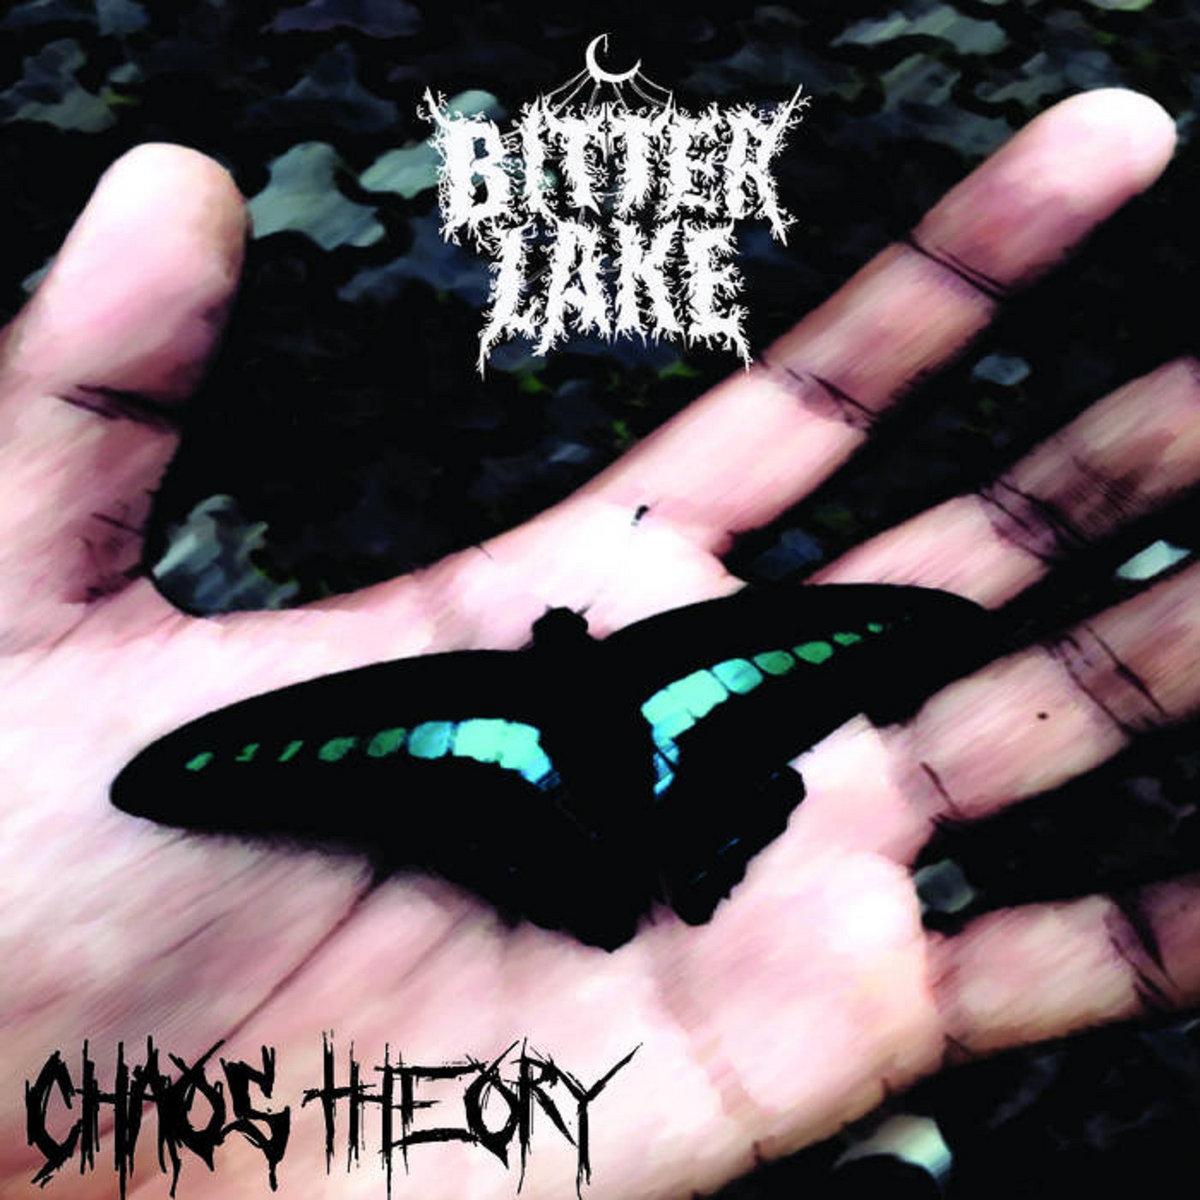 Chaos Theory (Multitrack Stems) | Bitter Lake